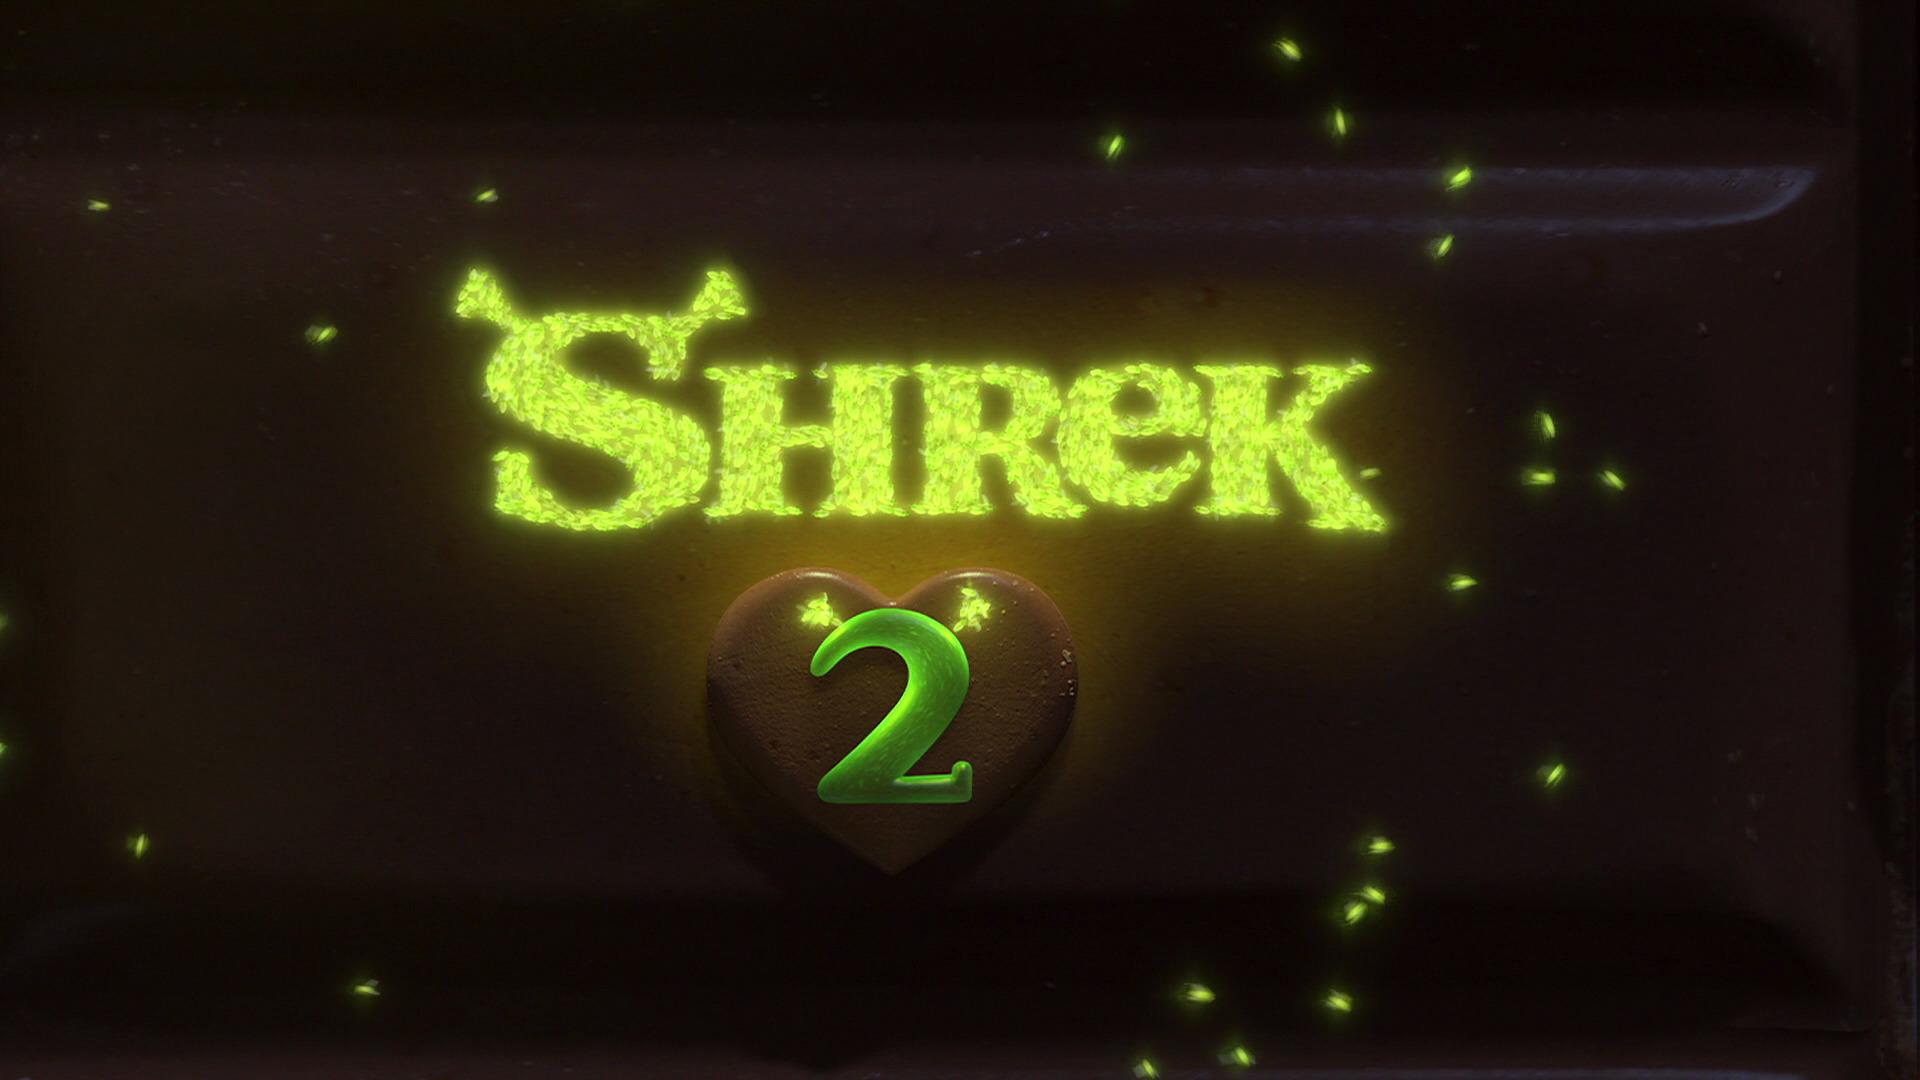 Shrek 2 2004 Animation Screencaps